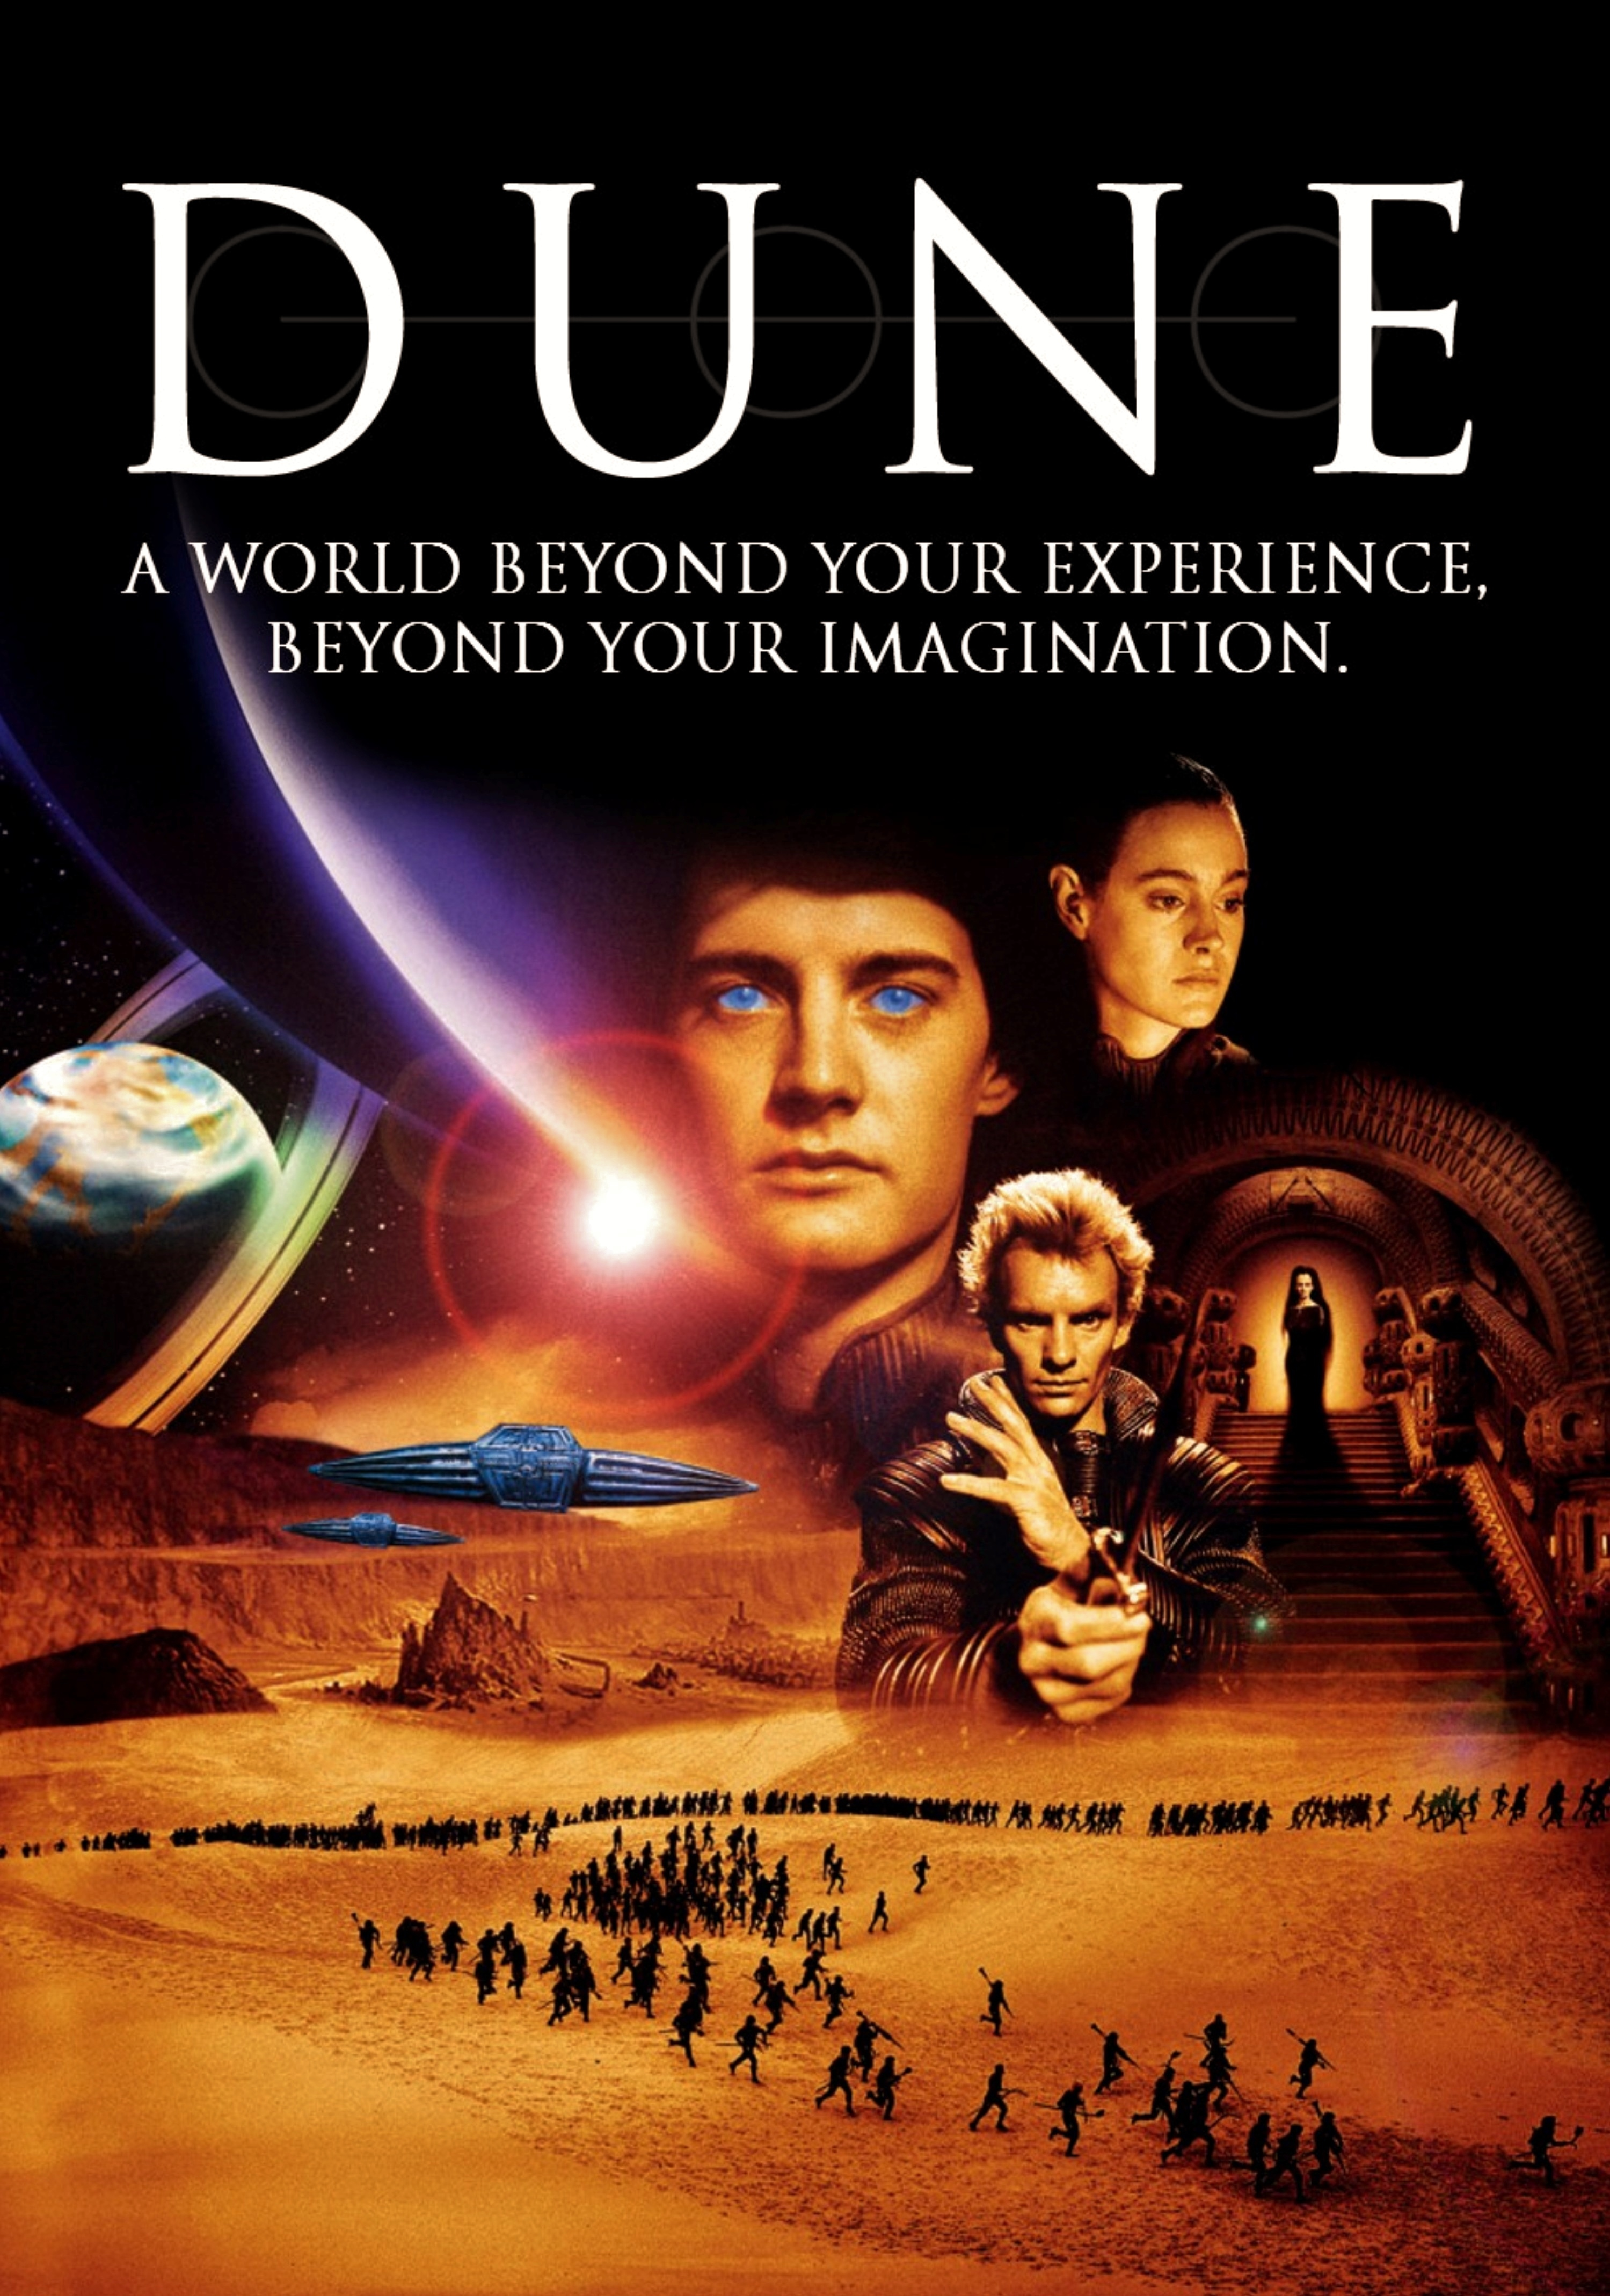 Dune Dvd Cover Artwork Chris Conway Art